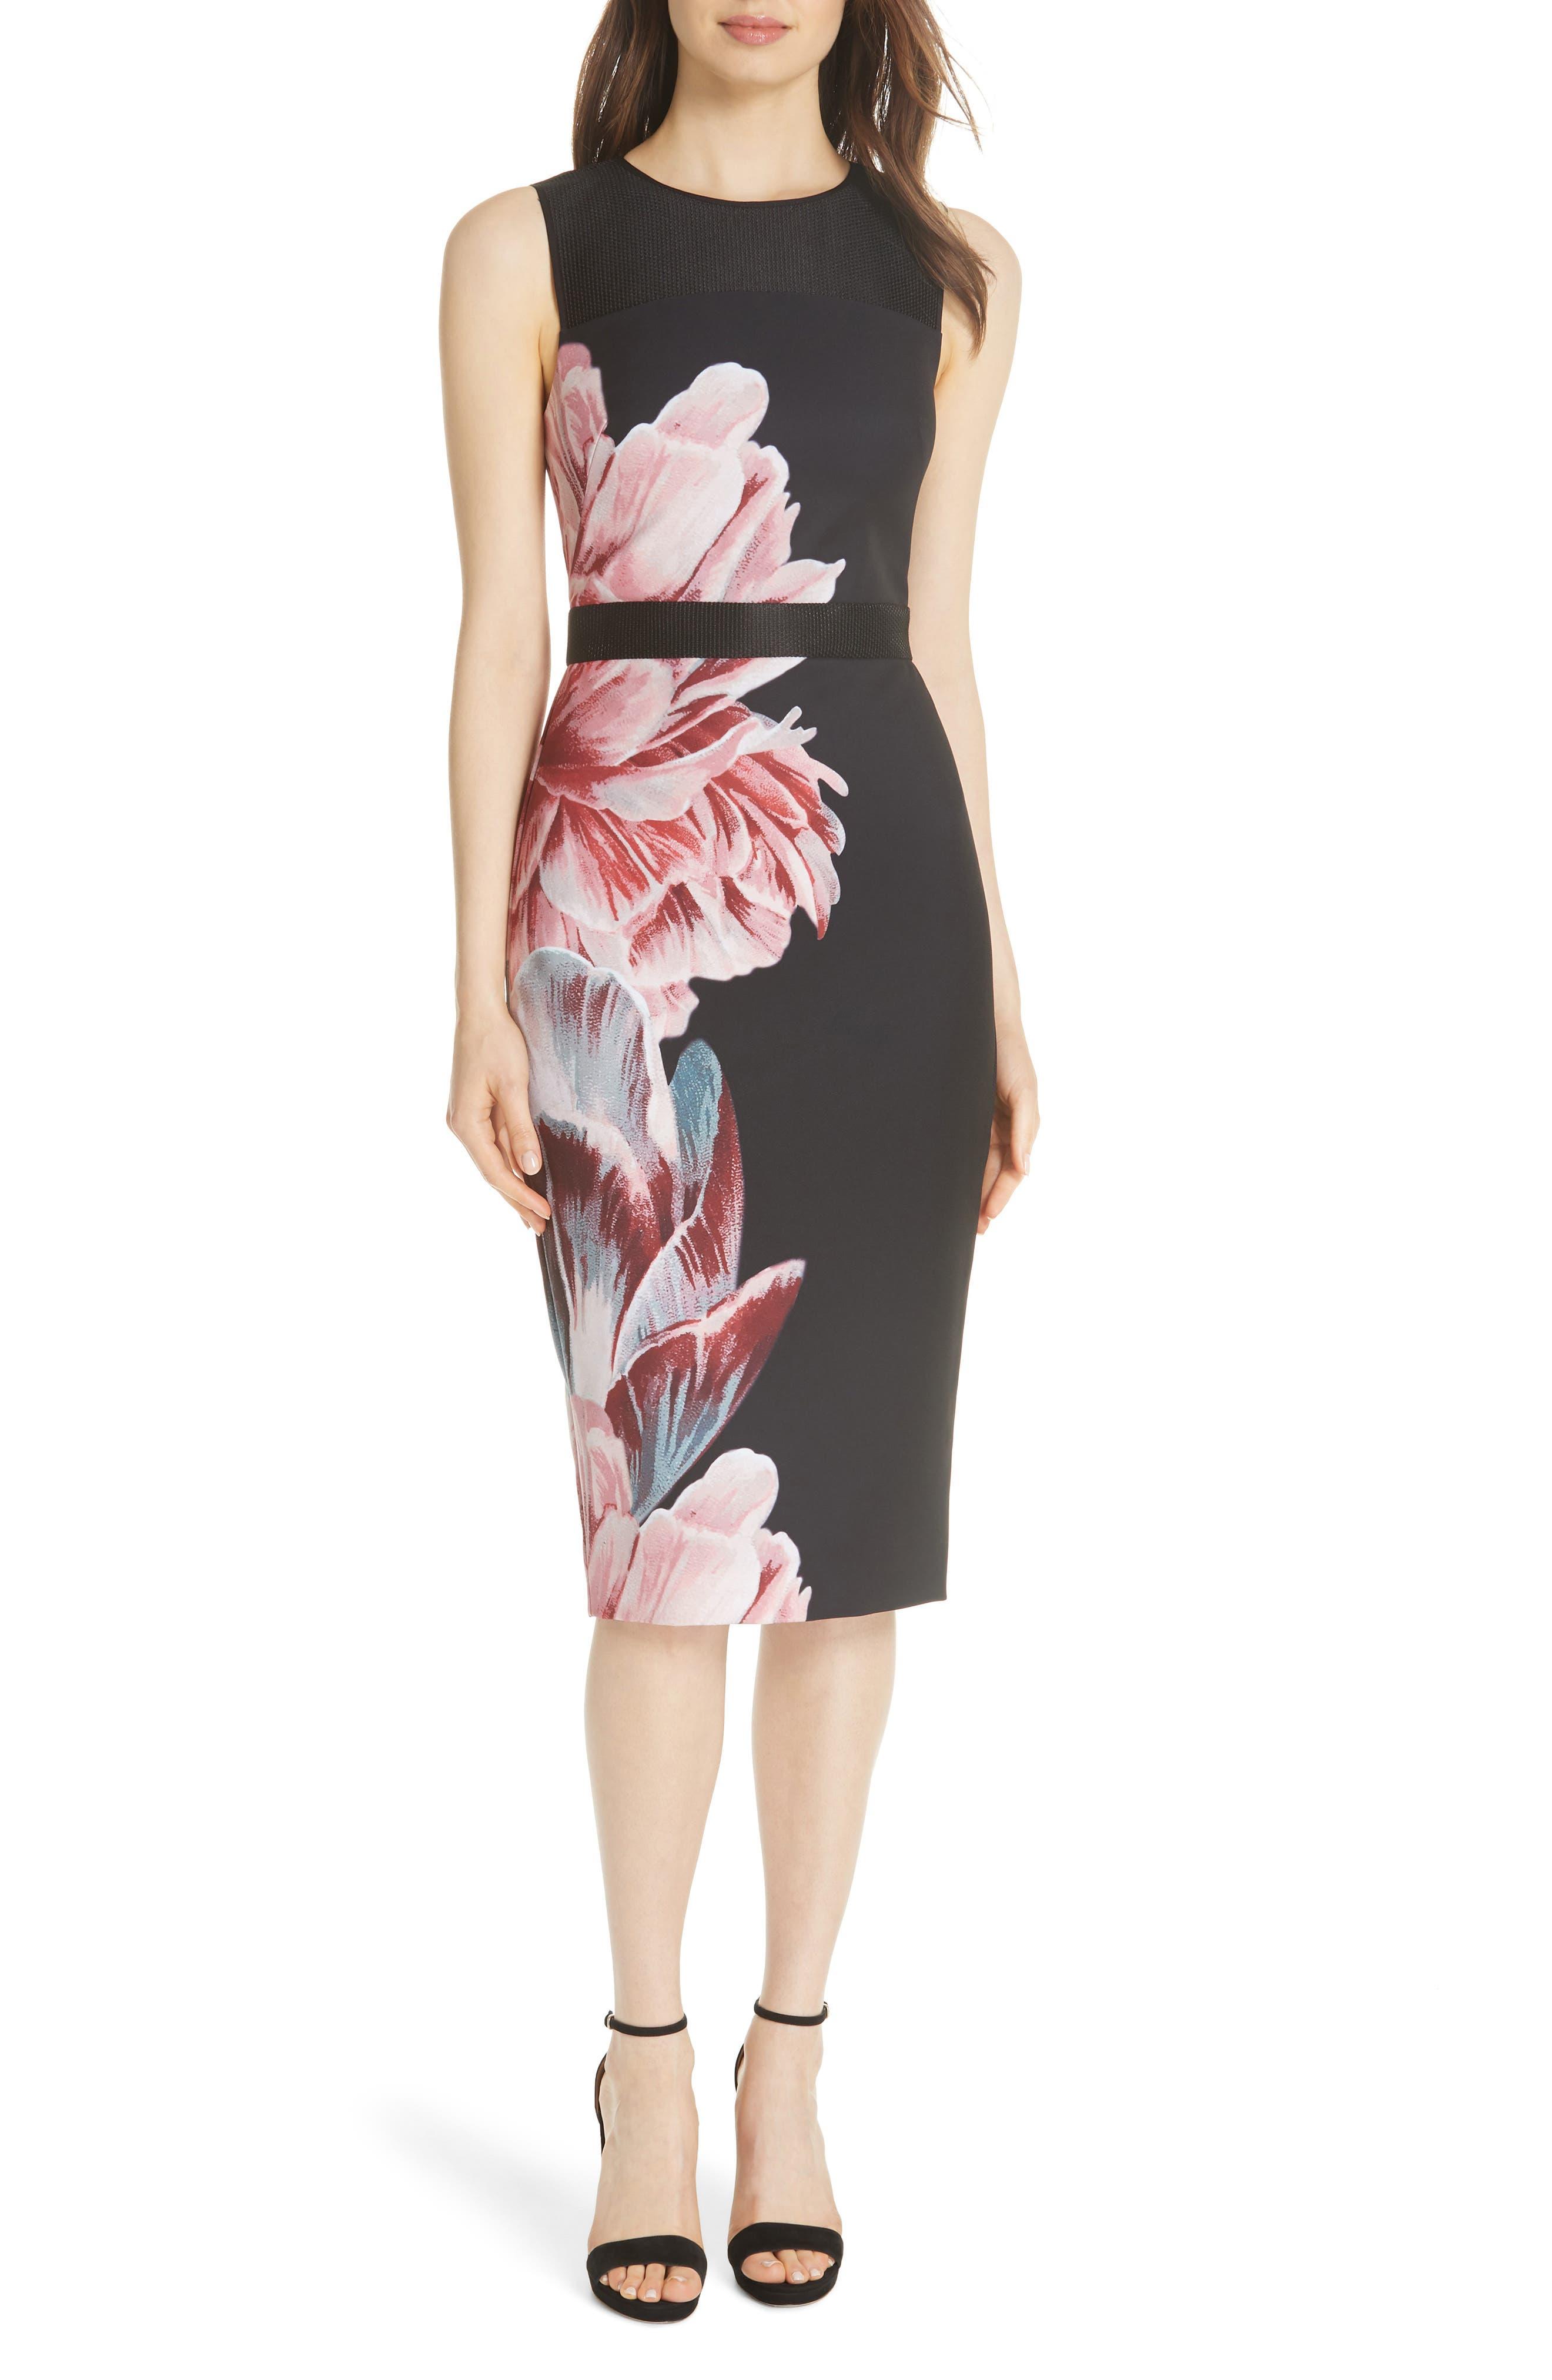 Xanadu Tranquility Sheath Dress,                         Main,                         color, BLACK